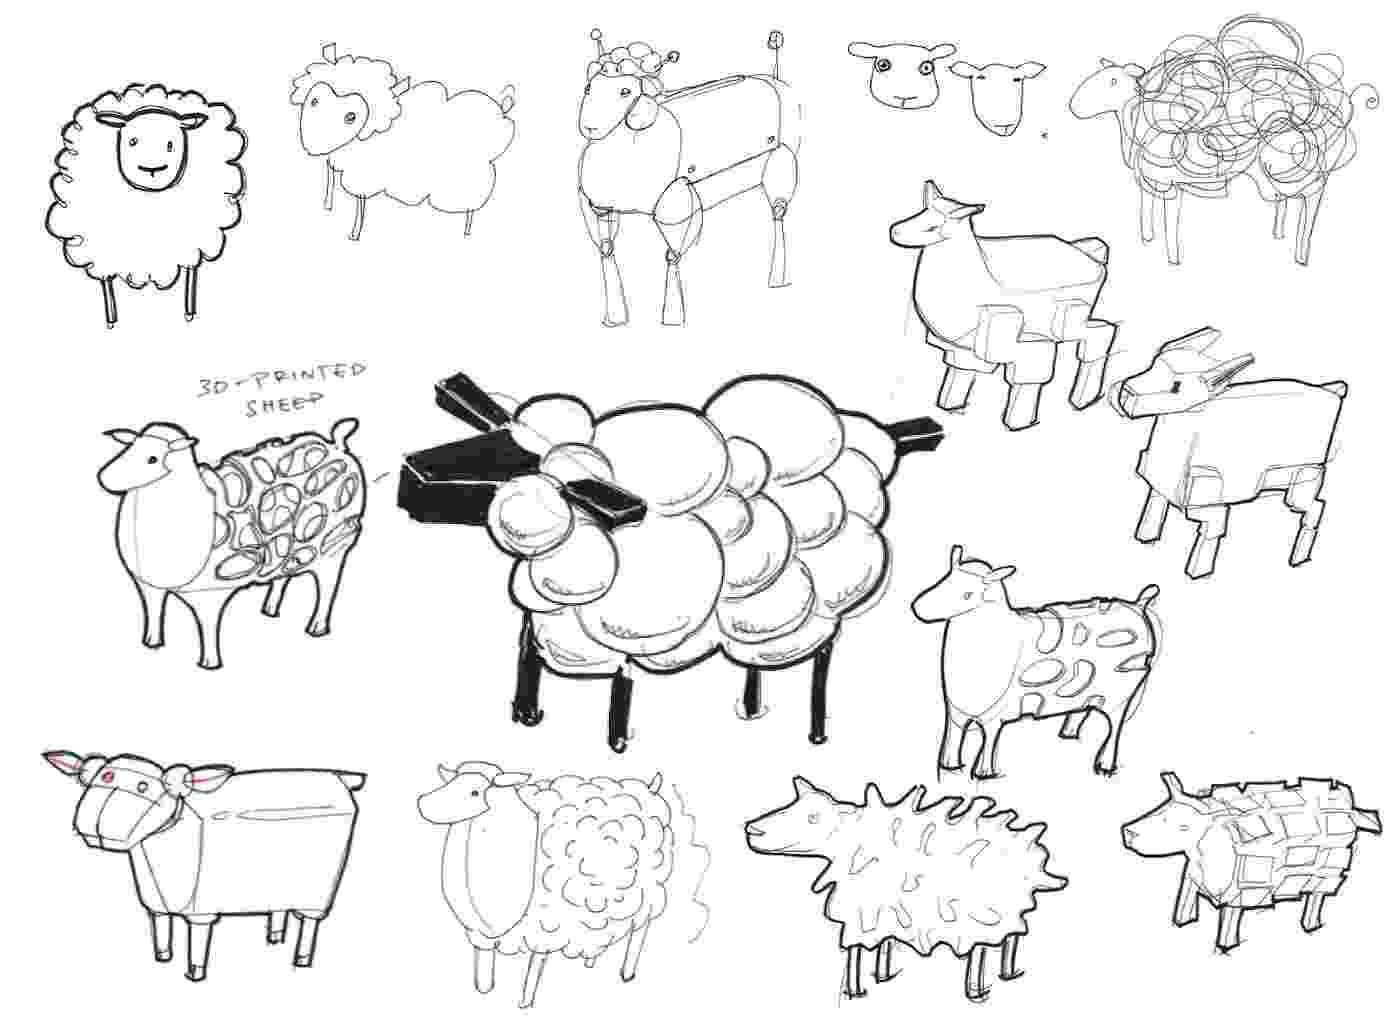 sketch of sheep sheep shape designing a divine 3d ovine for 39leo39 make sheep sketch of